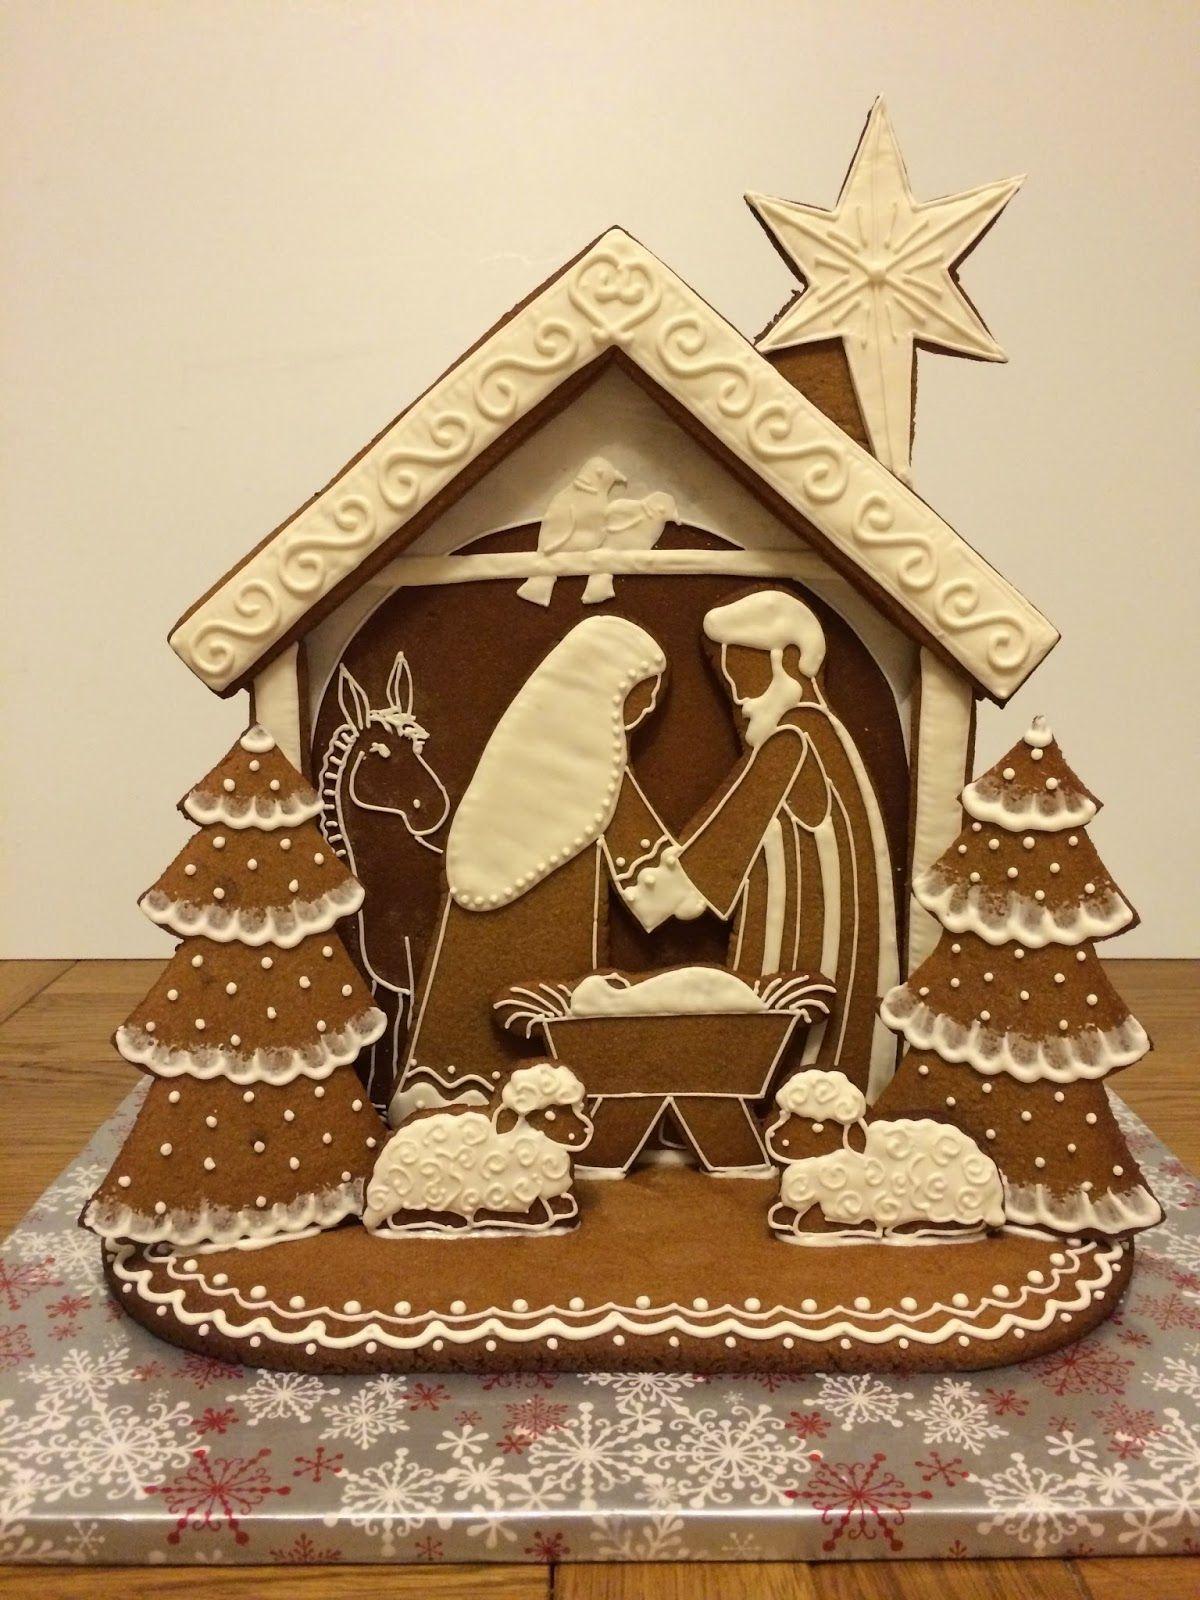 Elaine's Sweet Life: Gingerbread Nativity {Tutorial} | Christmas gingerbread house, Gingerbread, Gingerbread house cookies